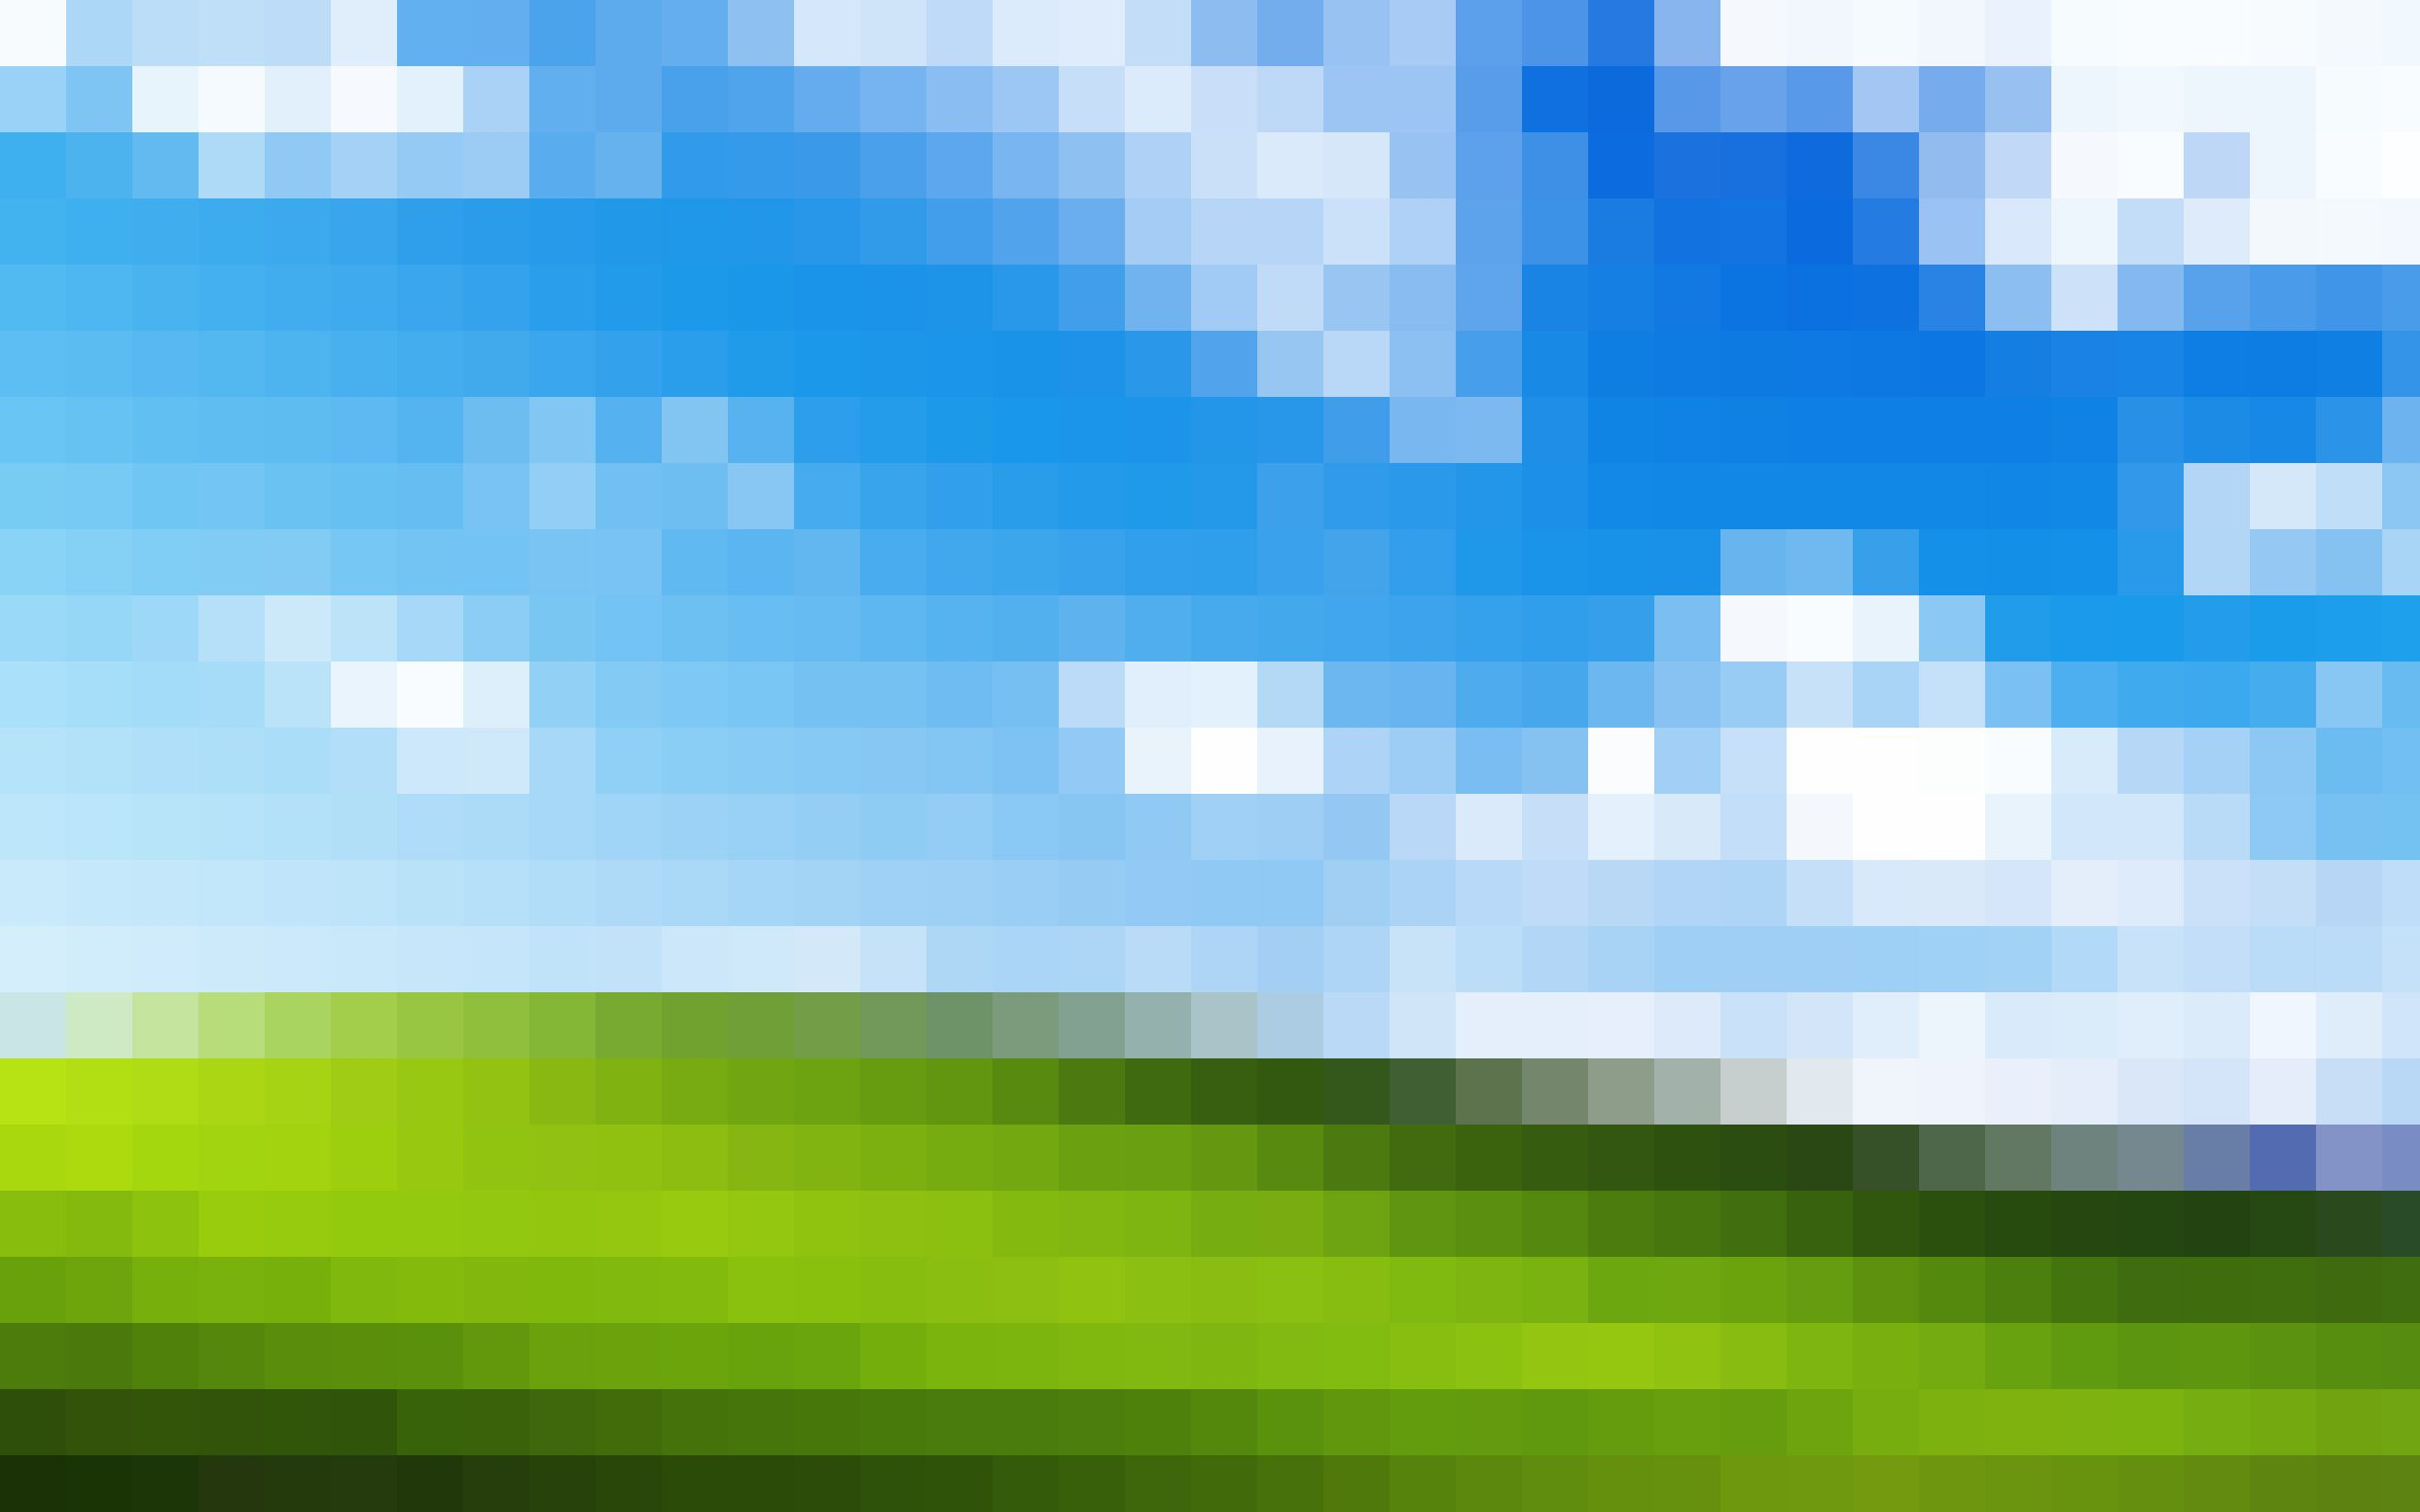 Xp Aurora By Skeleton Simple Desktops Mosaic Wallpaper Desktop Pictures Wallpaper